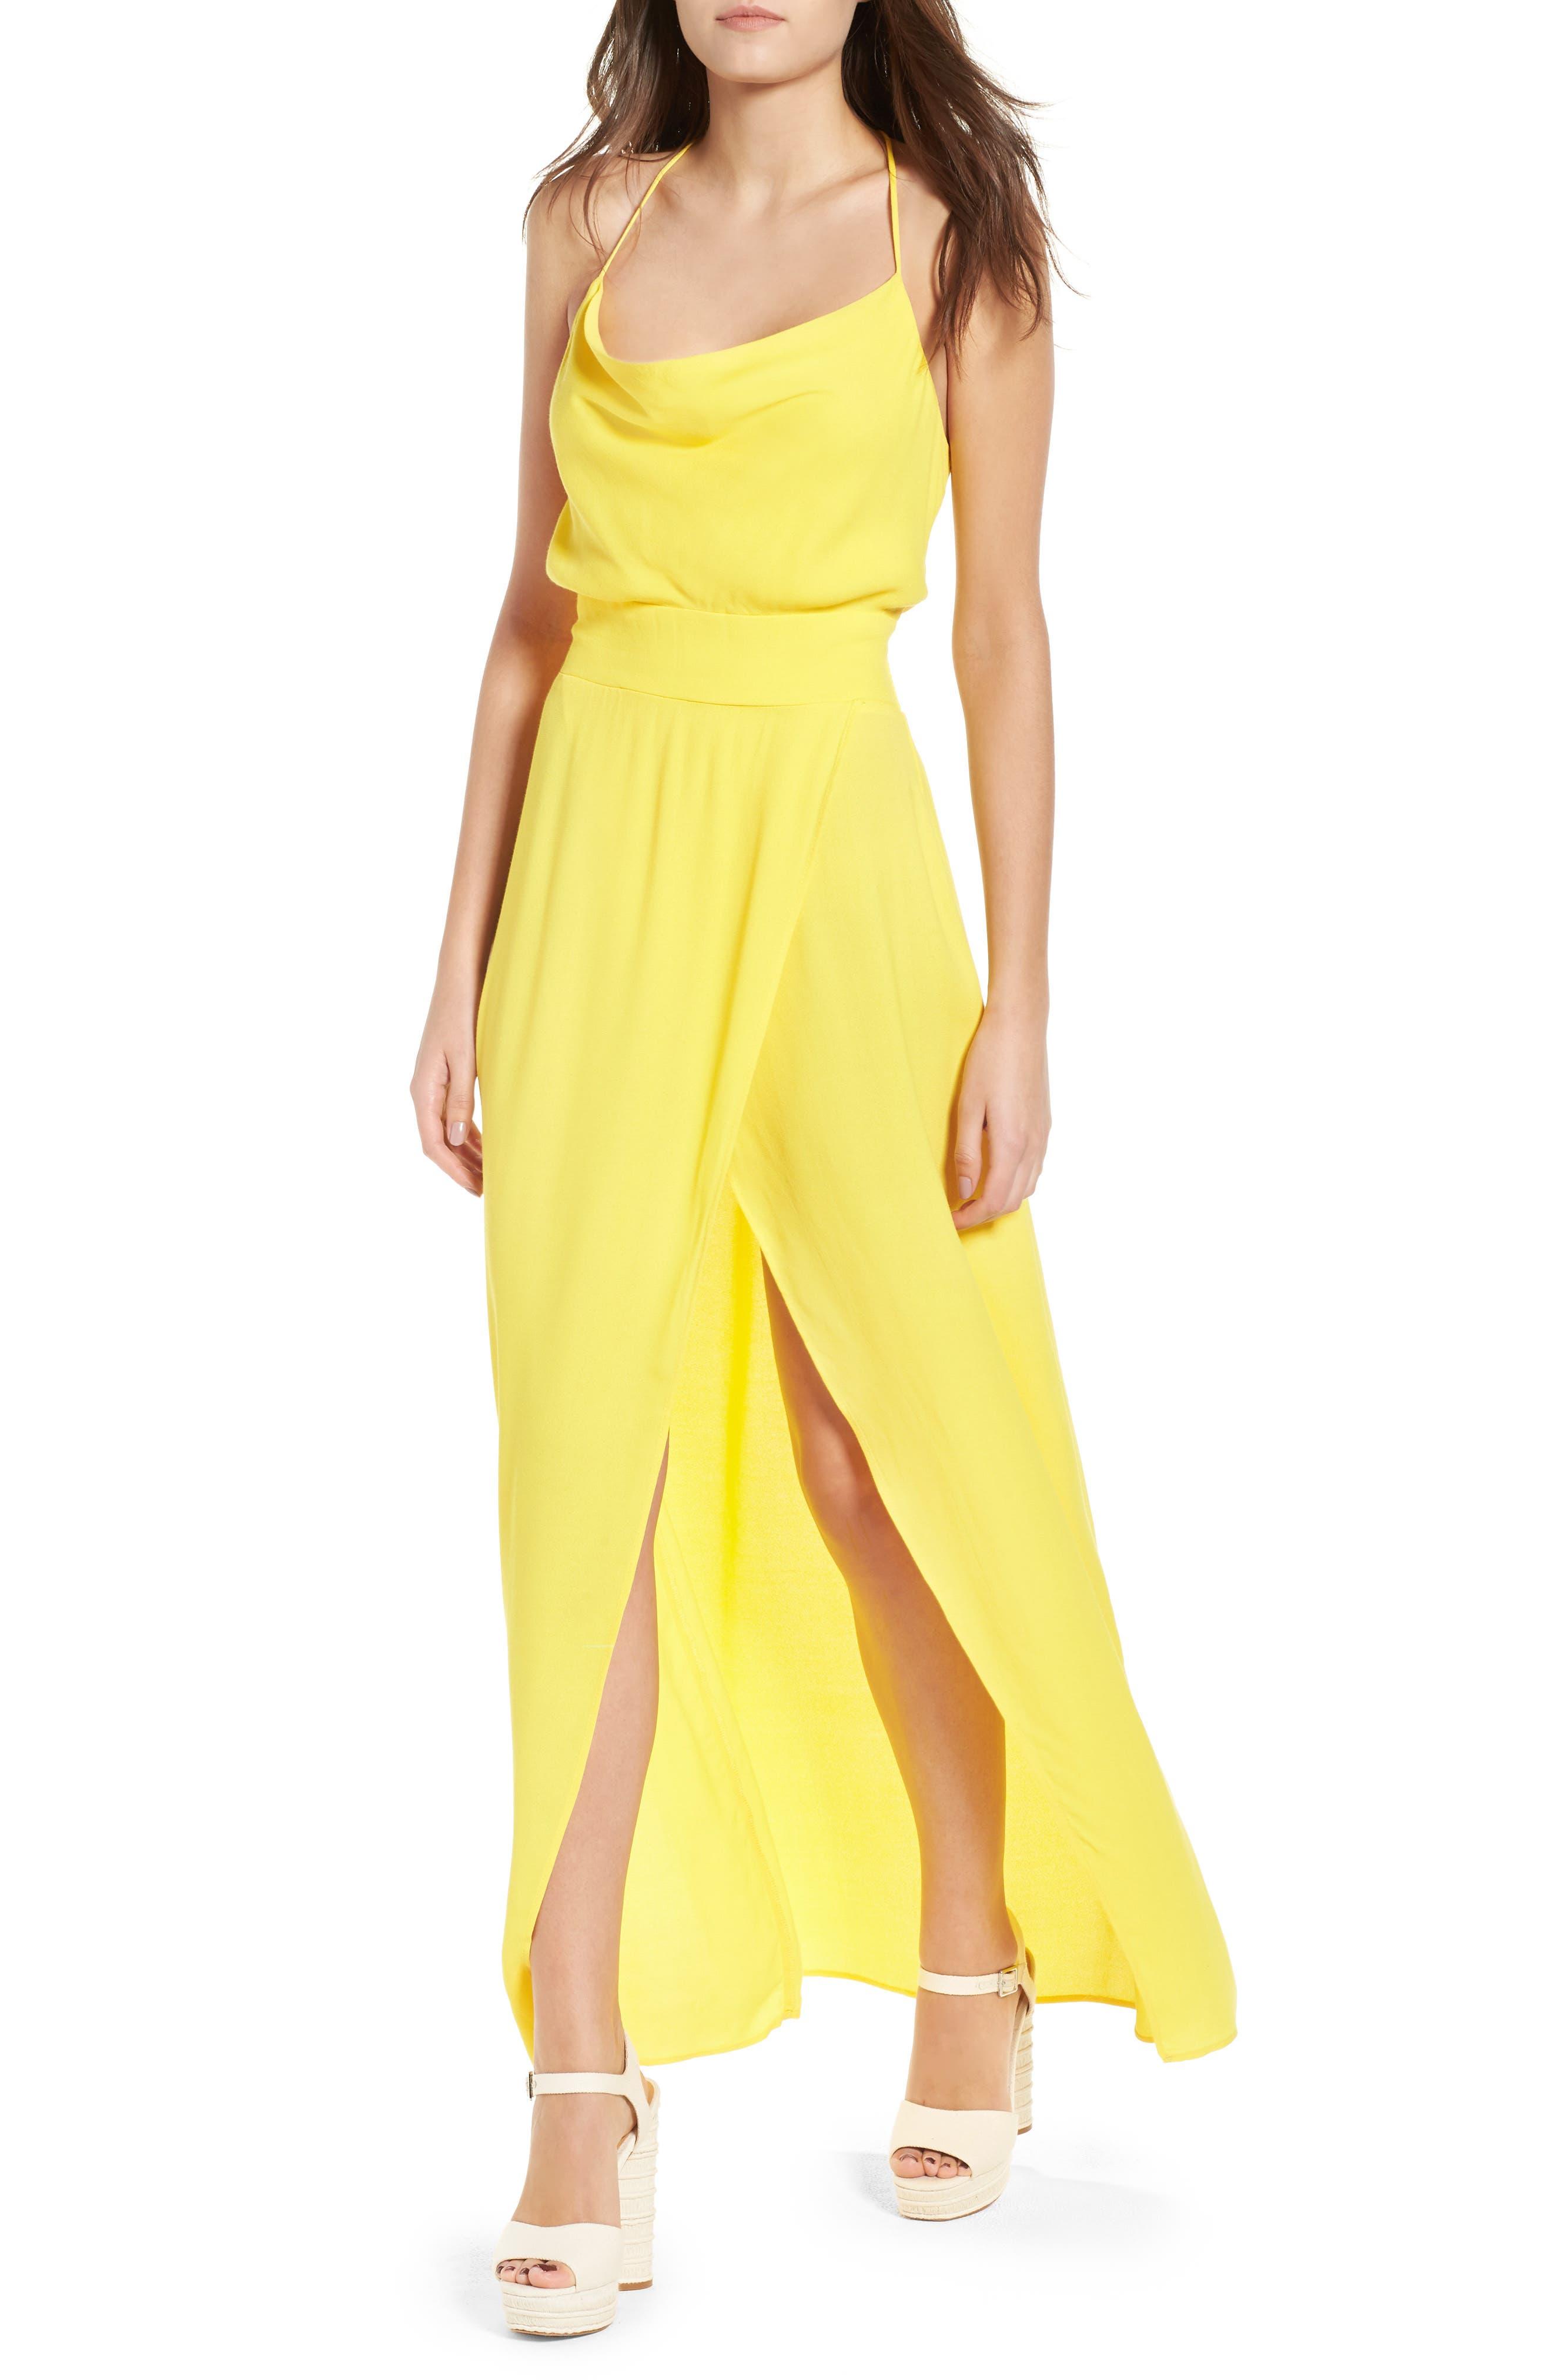 Rain Maxi Dress,                         Main,                         color, 710